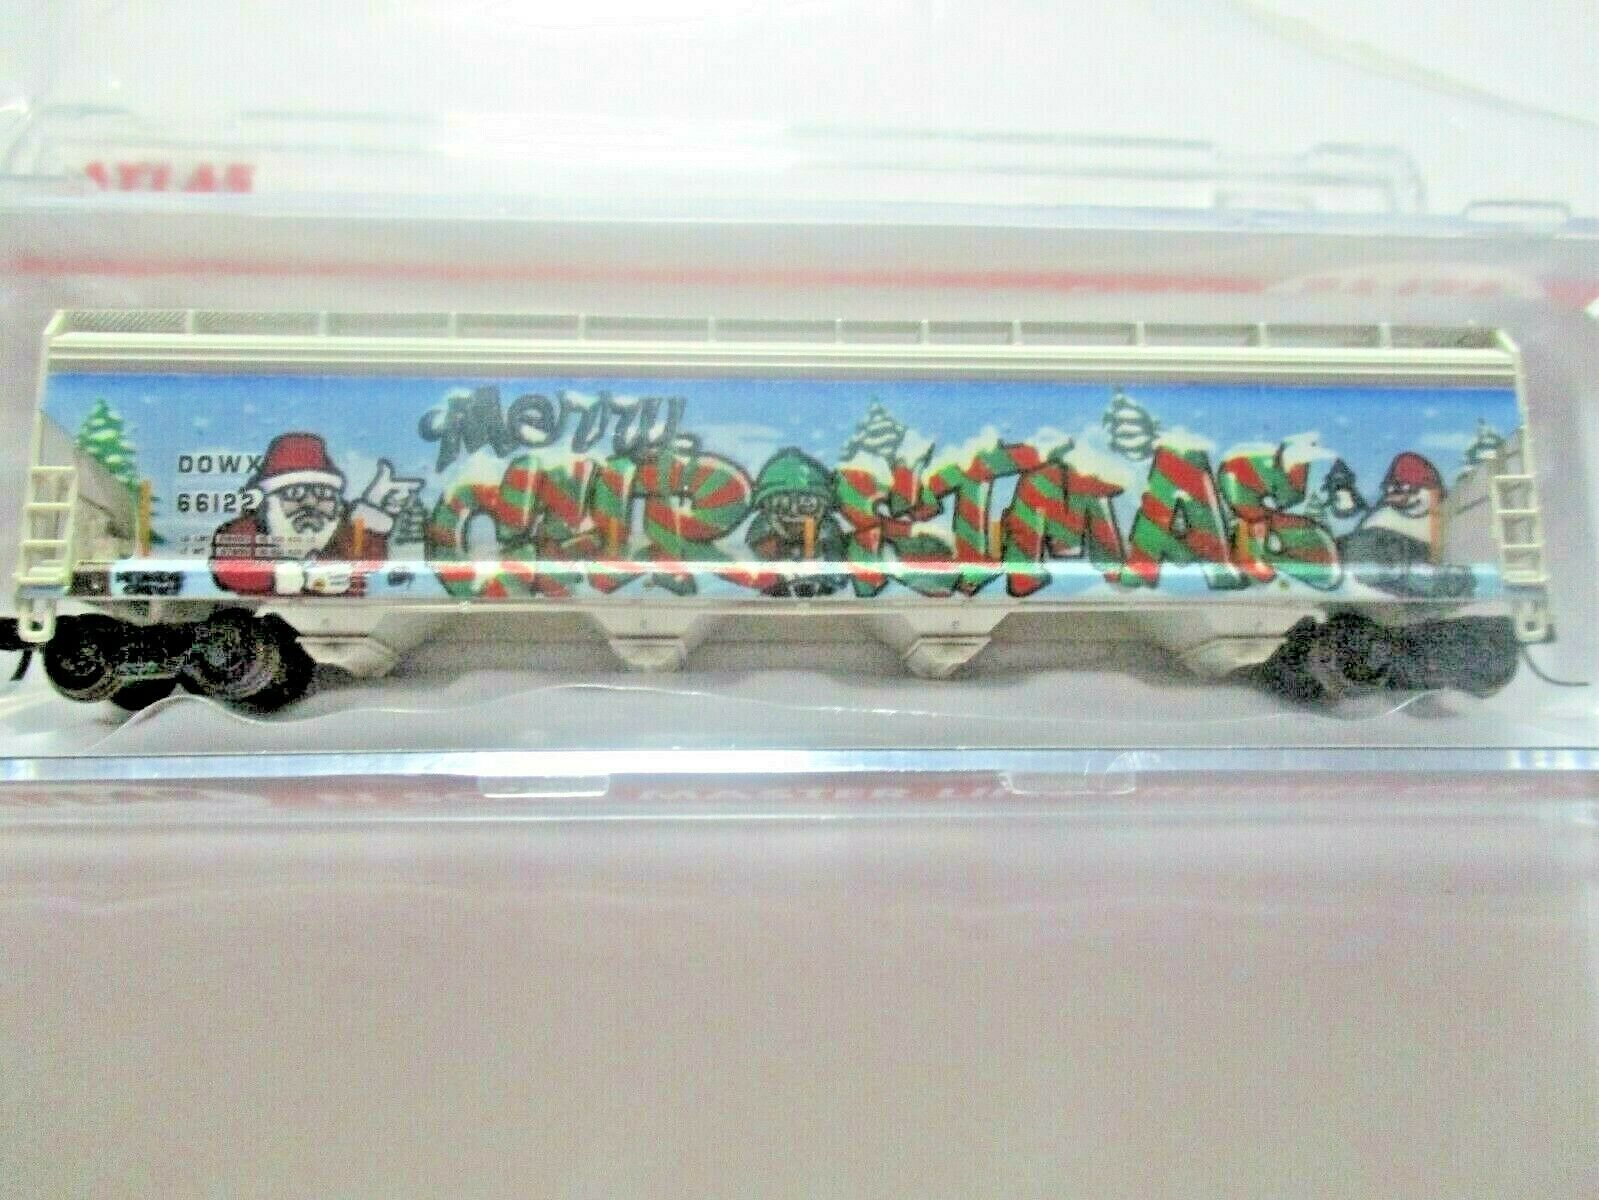 Atlas # 50005645 (Chrstmas Graffiti) ACF 580 Plastics Hopper #66122 N-Scale